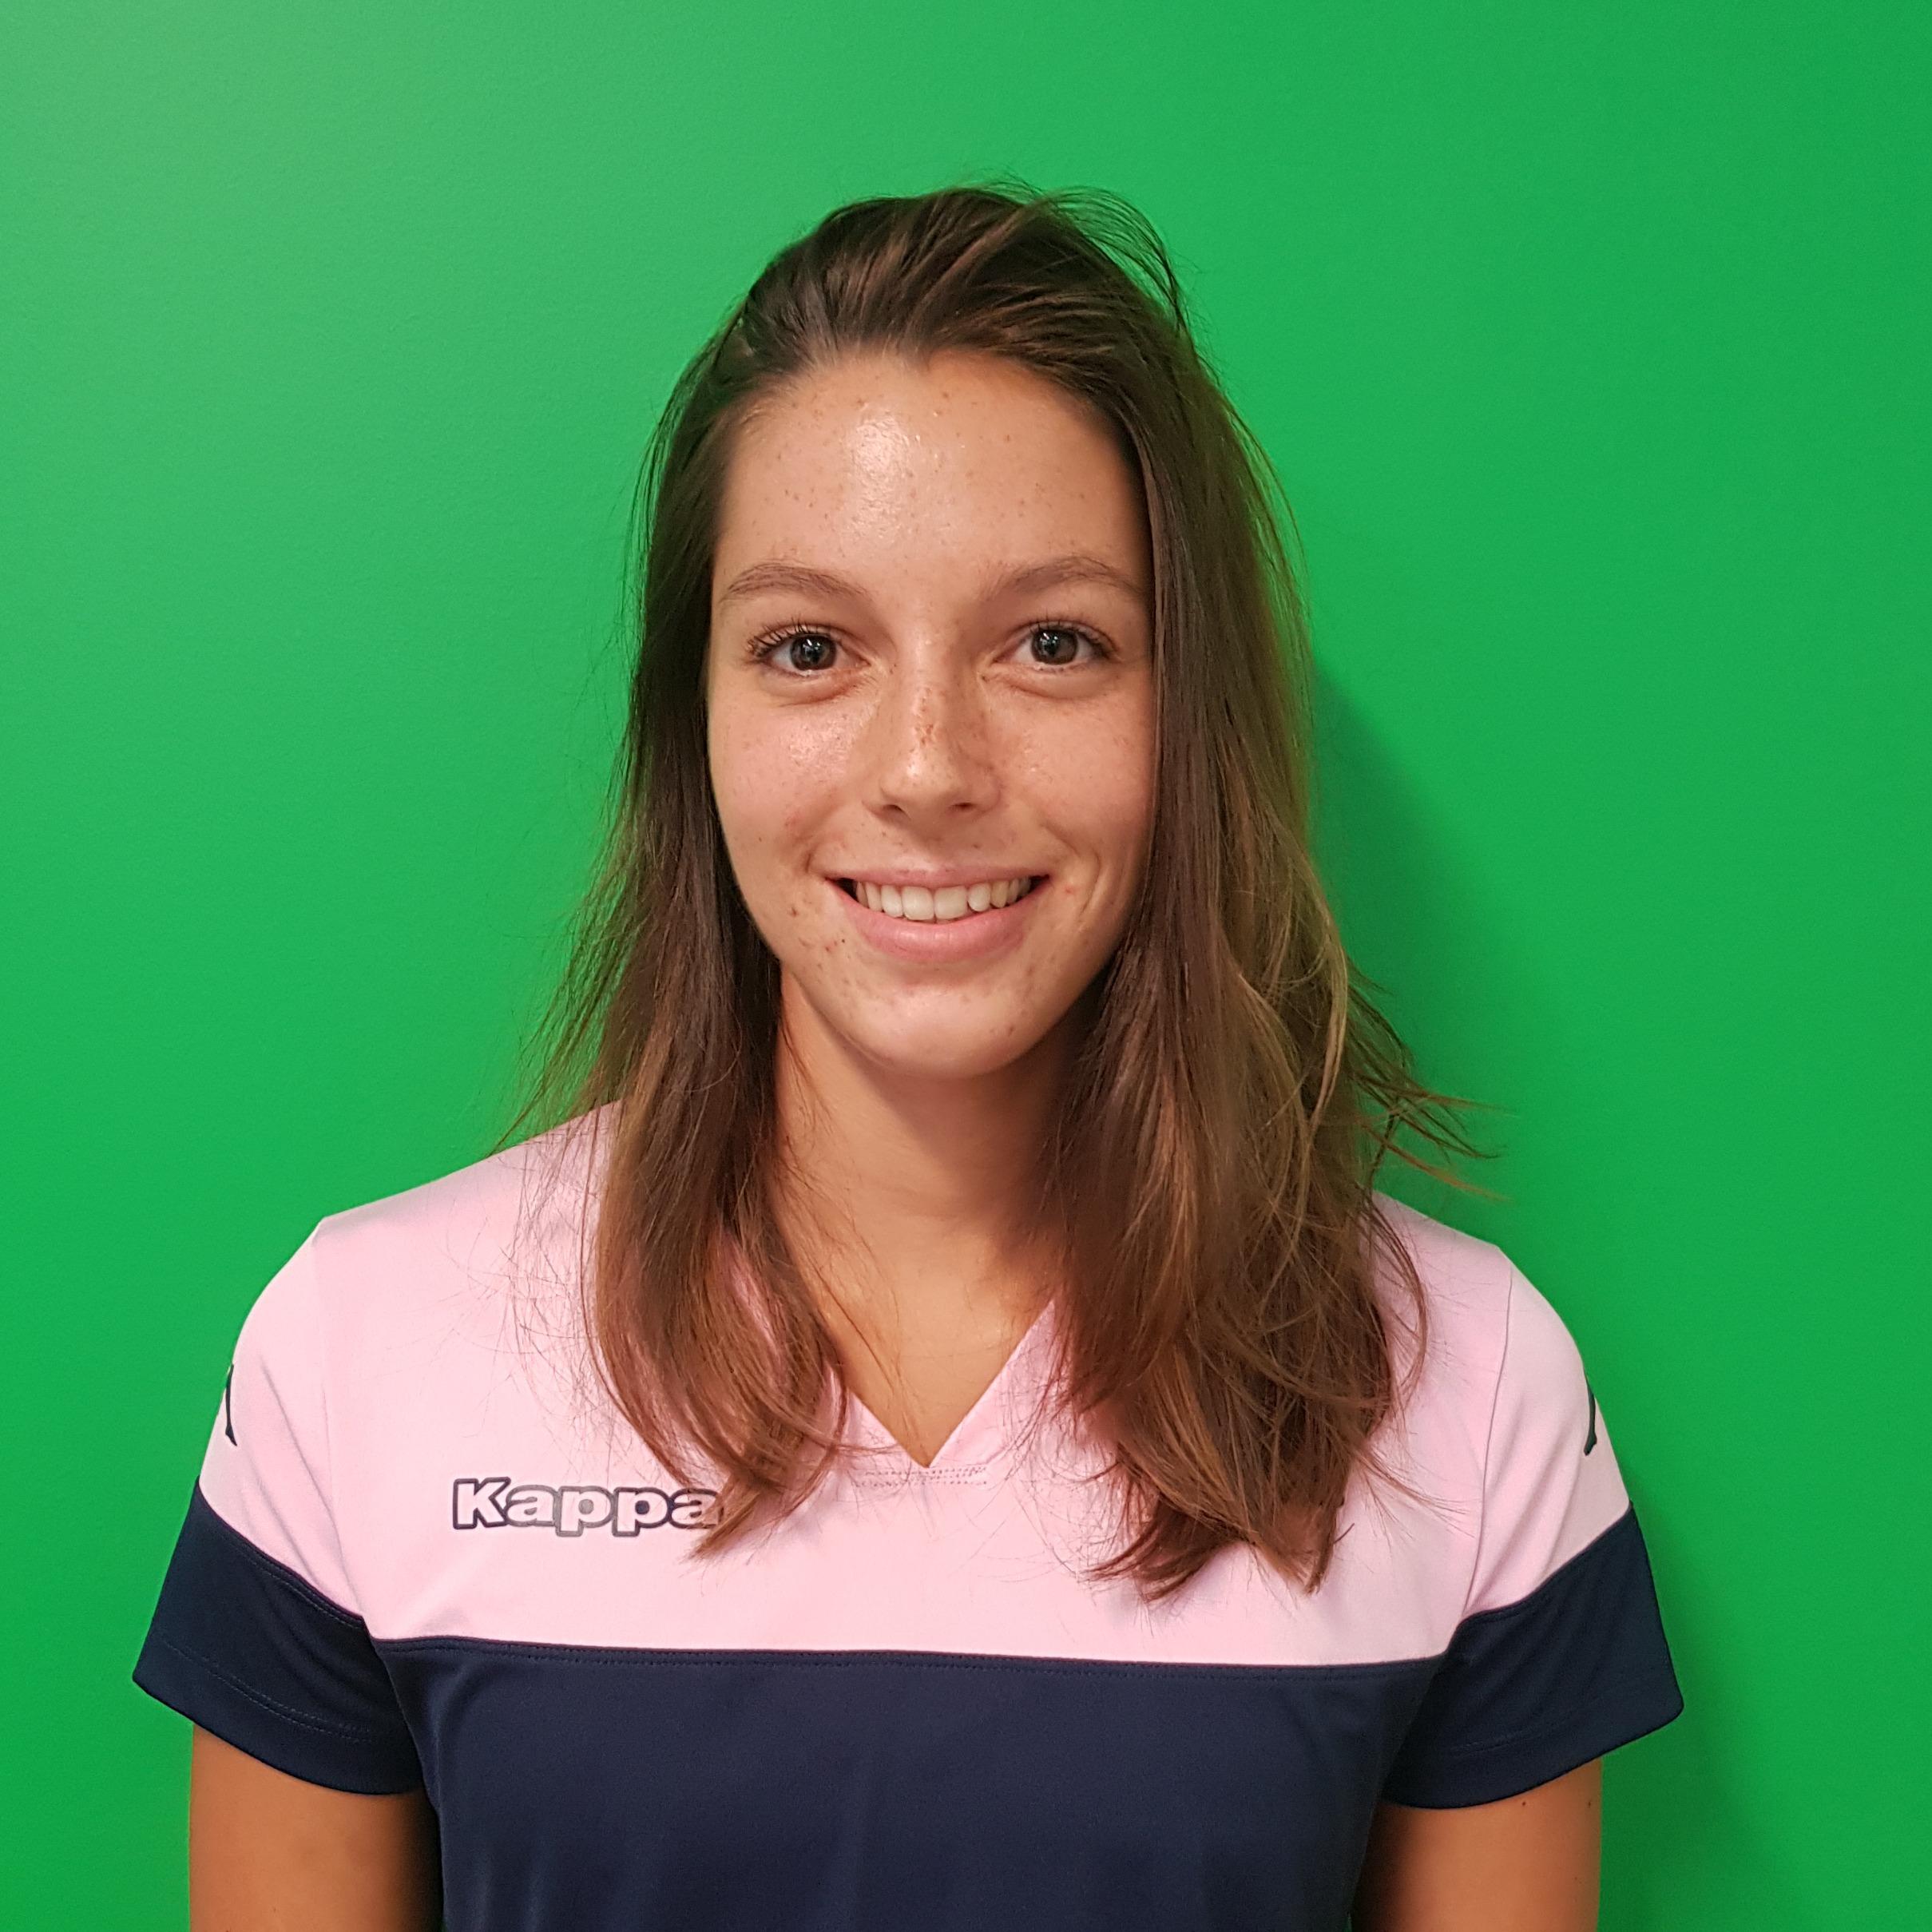 Charlotte Delapierre